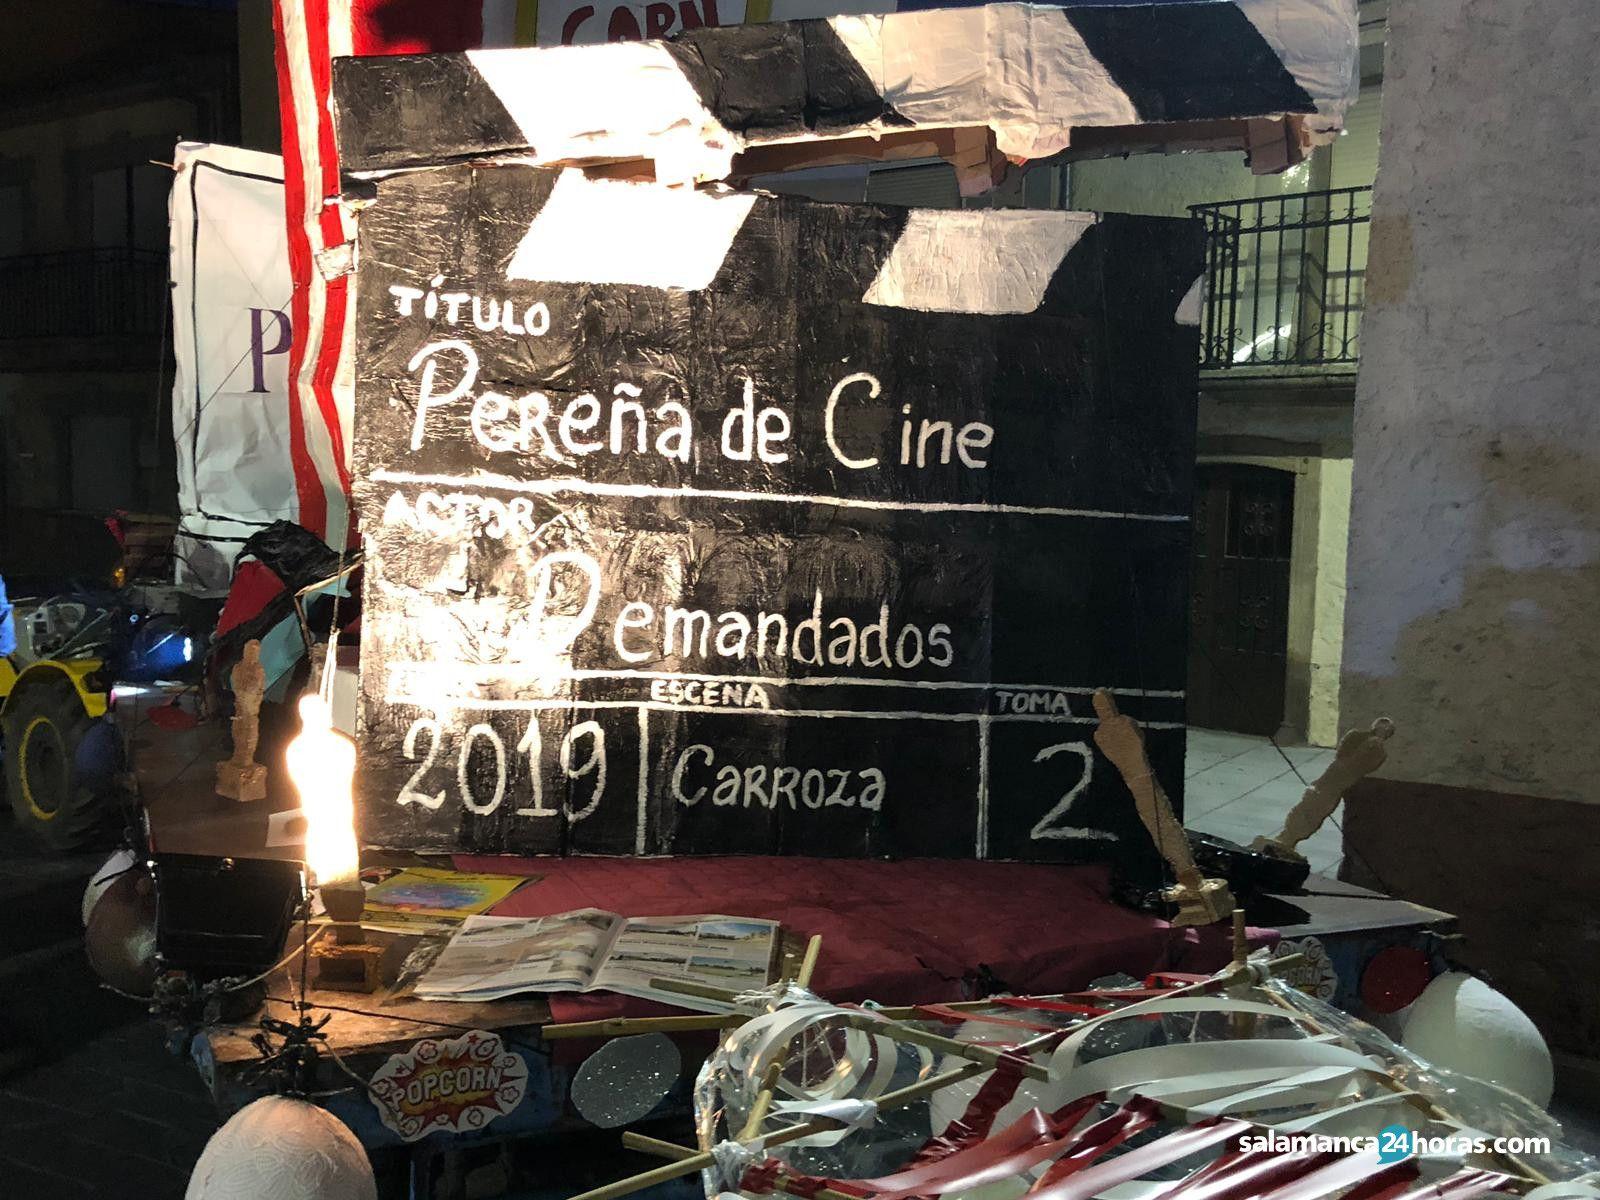 Fiestas de pereña (25)